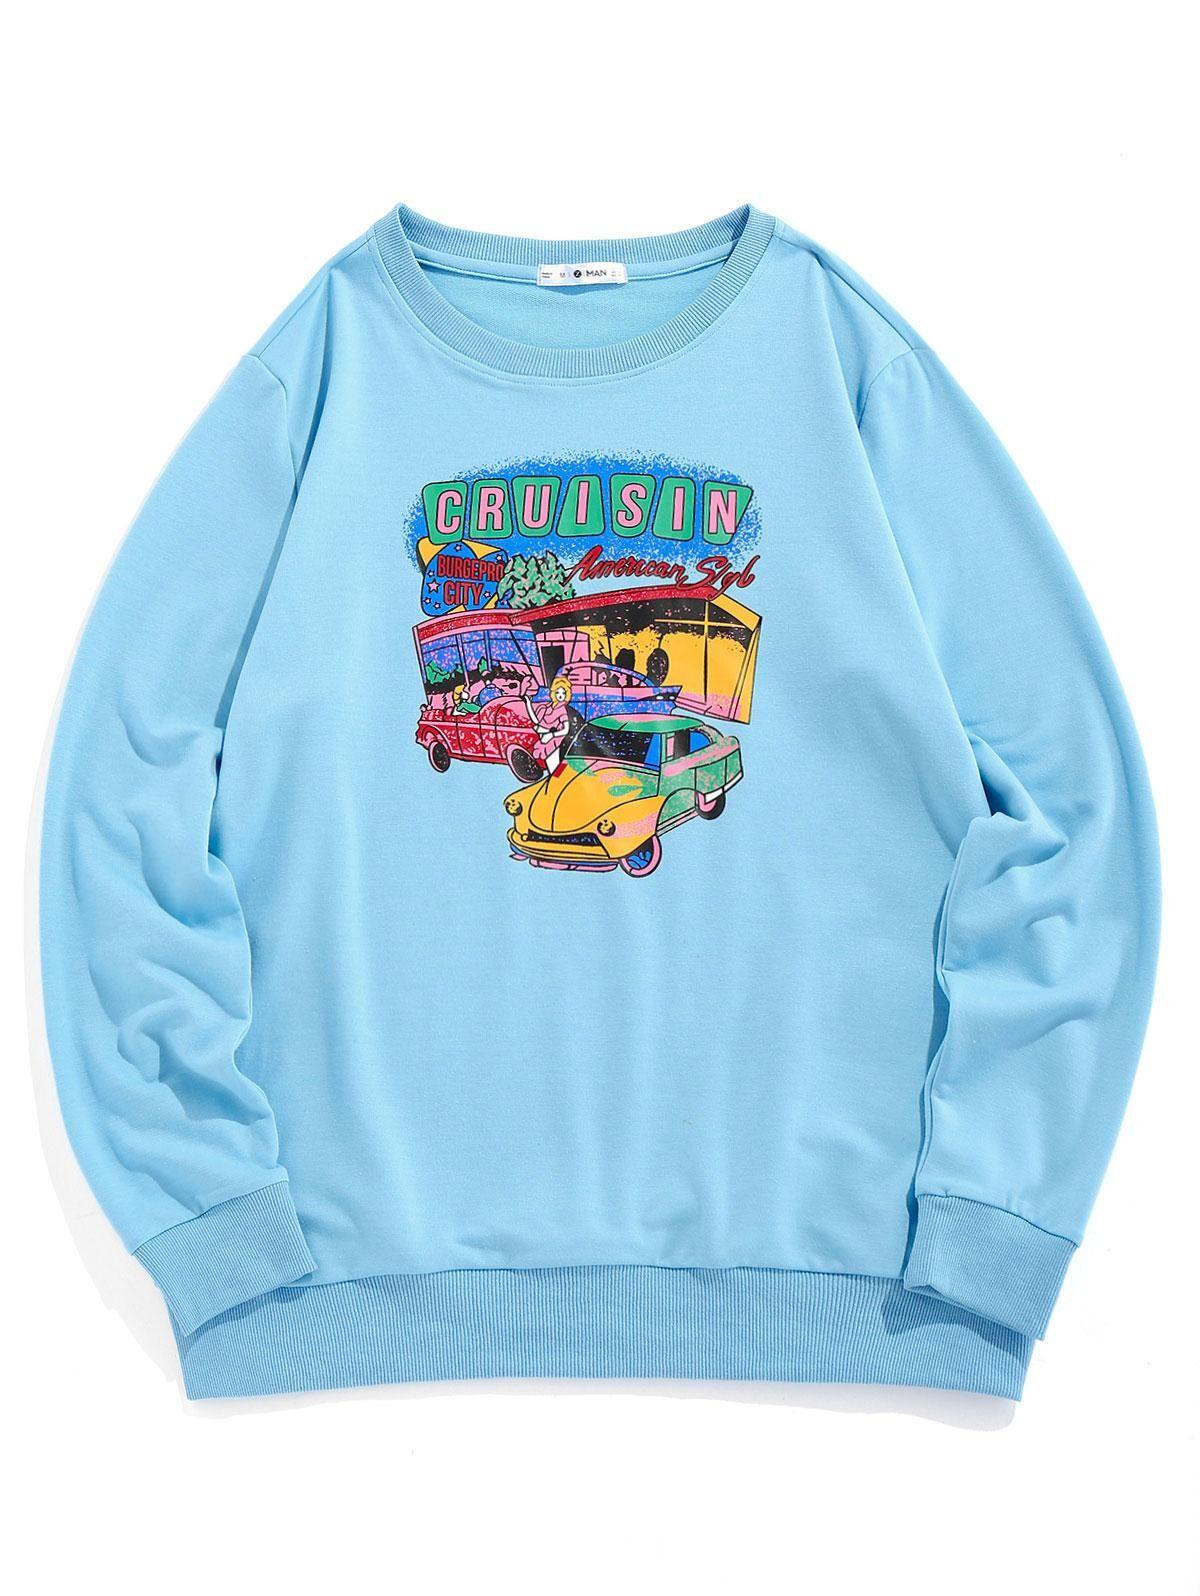 ZAFUL Cartoon Car Print Graphic Sweatshirt in LIGHT BLUE - Size: Extra Large